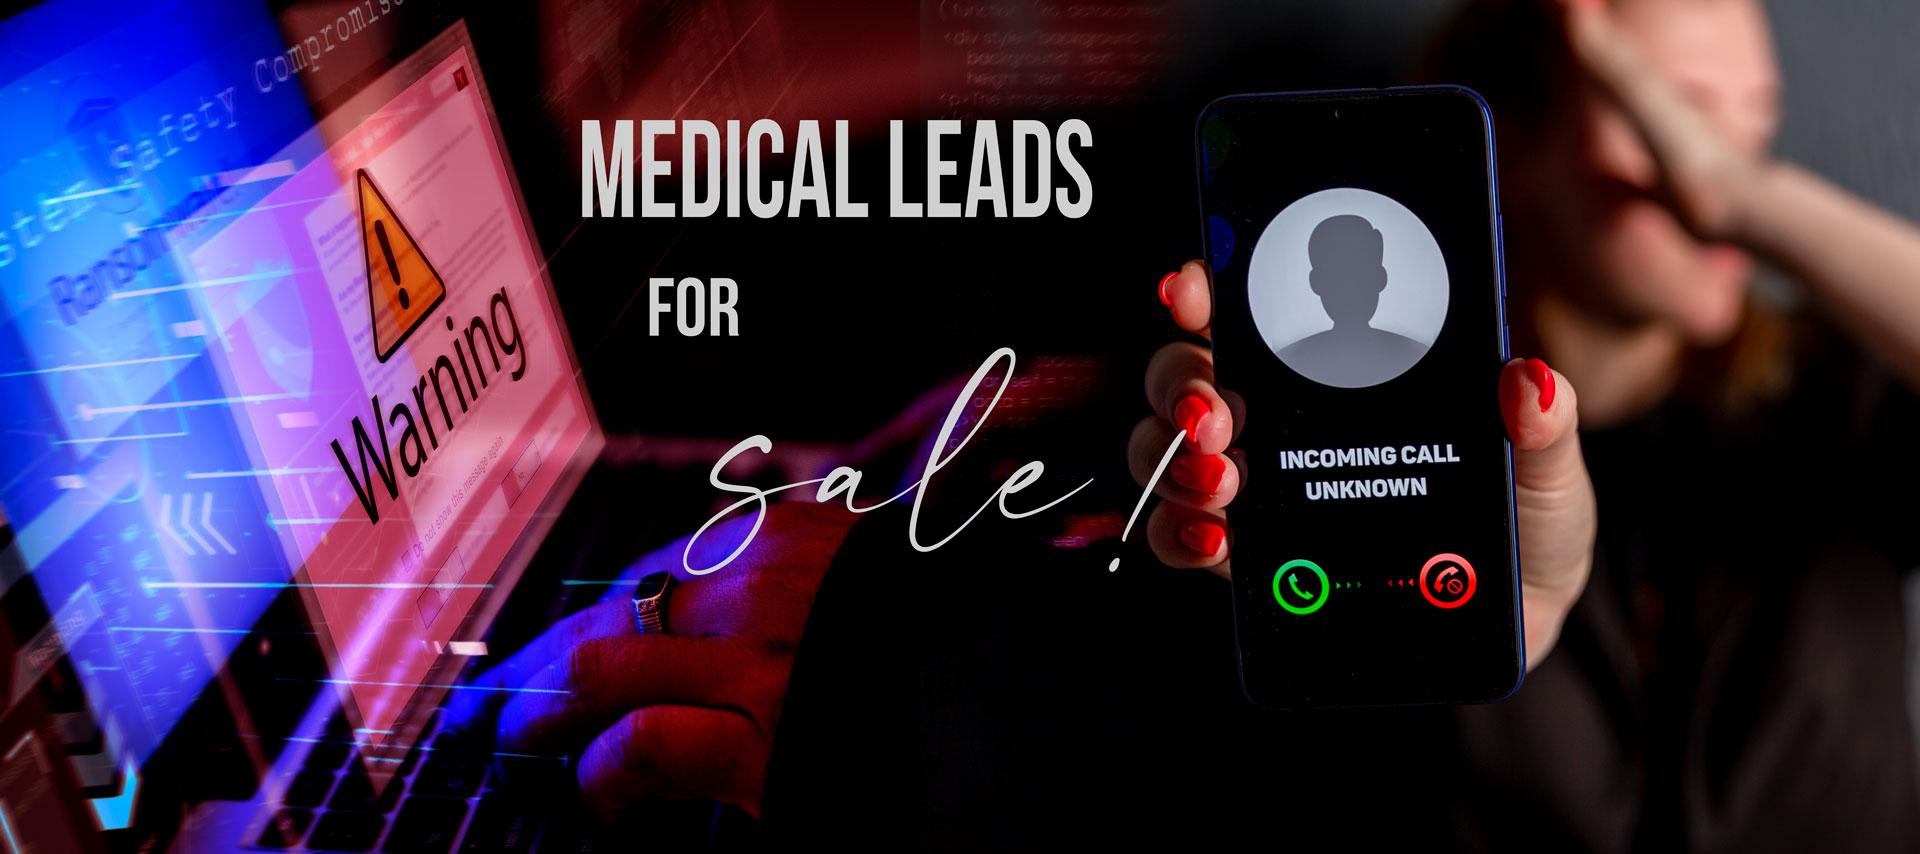 Medical Lead Management